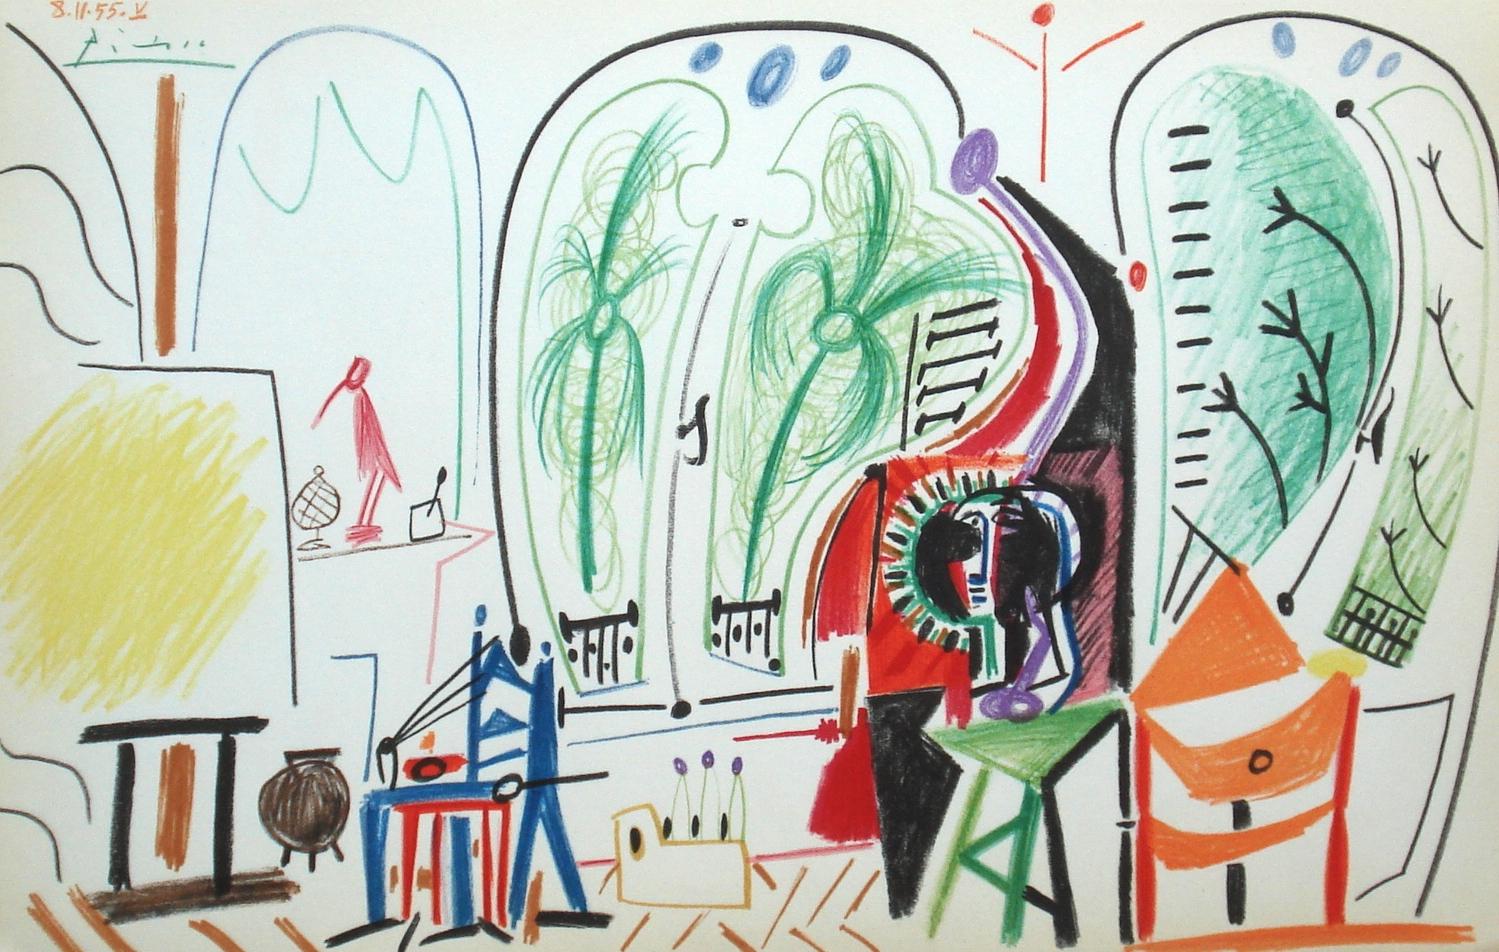 Year: 1960 Medium: Lithograph Image size: 11 x 17